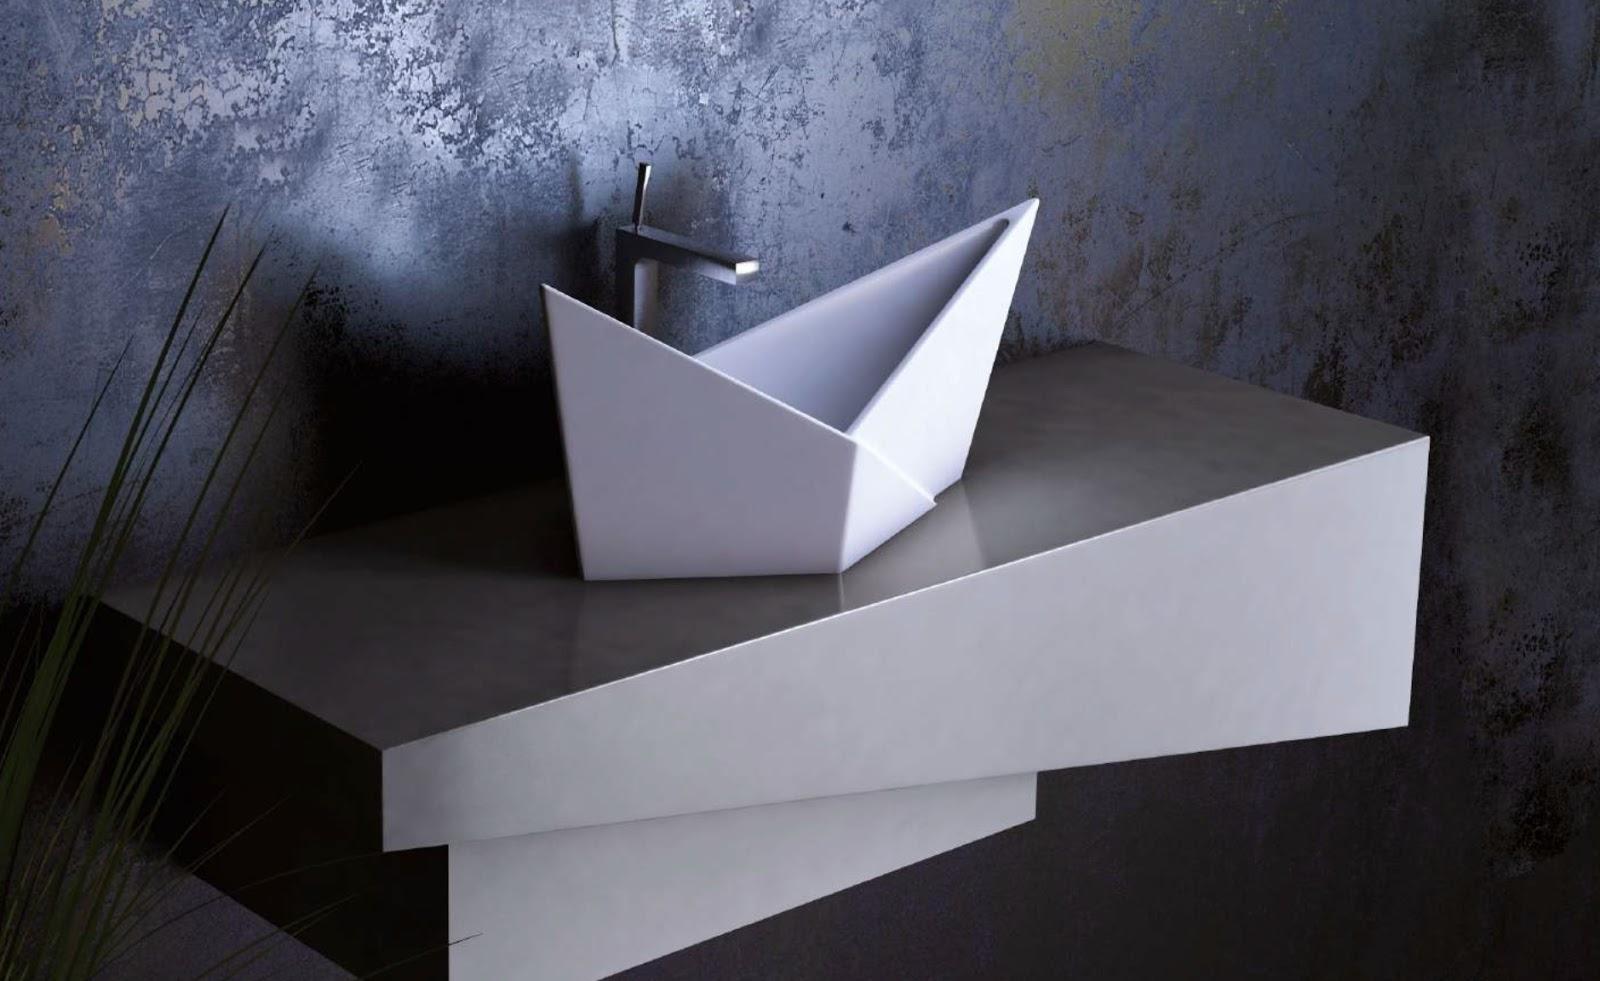 Lavoar de baie Olimpia in forma de barcuta